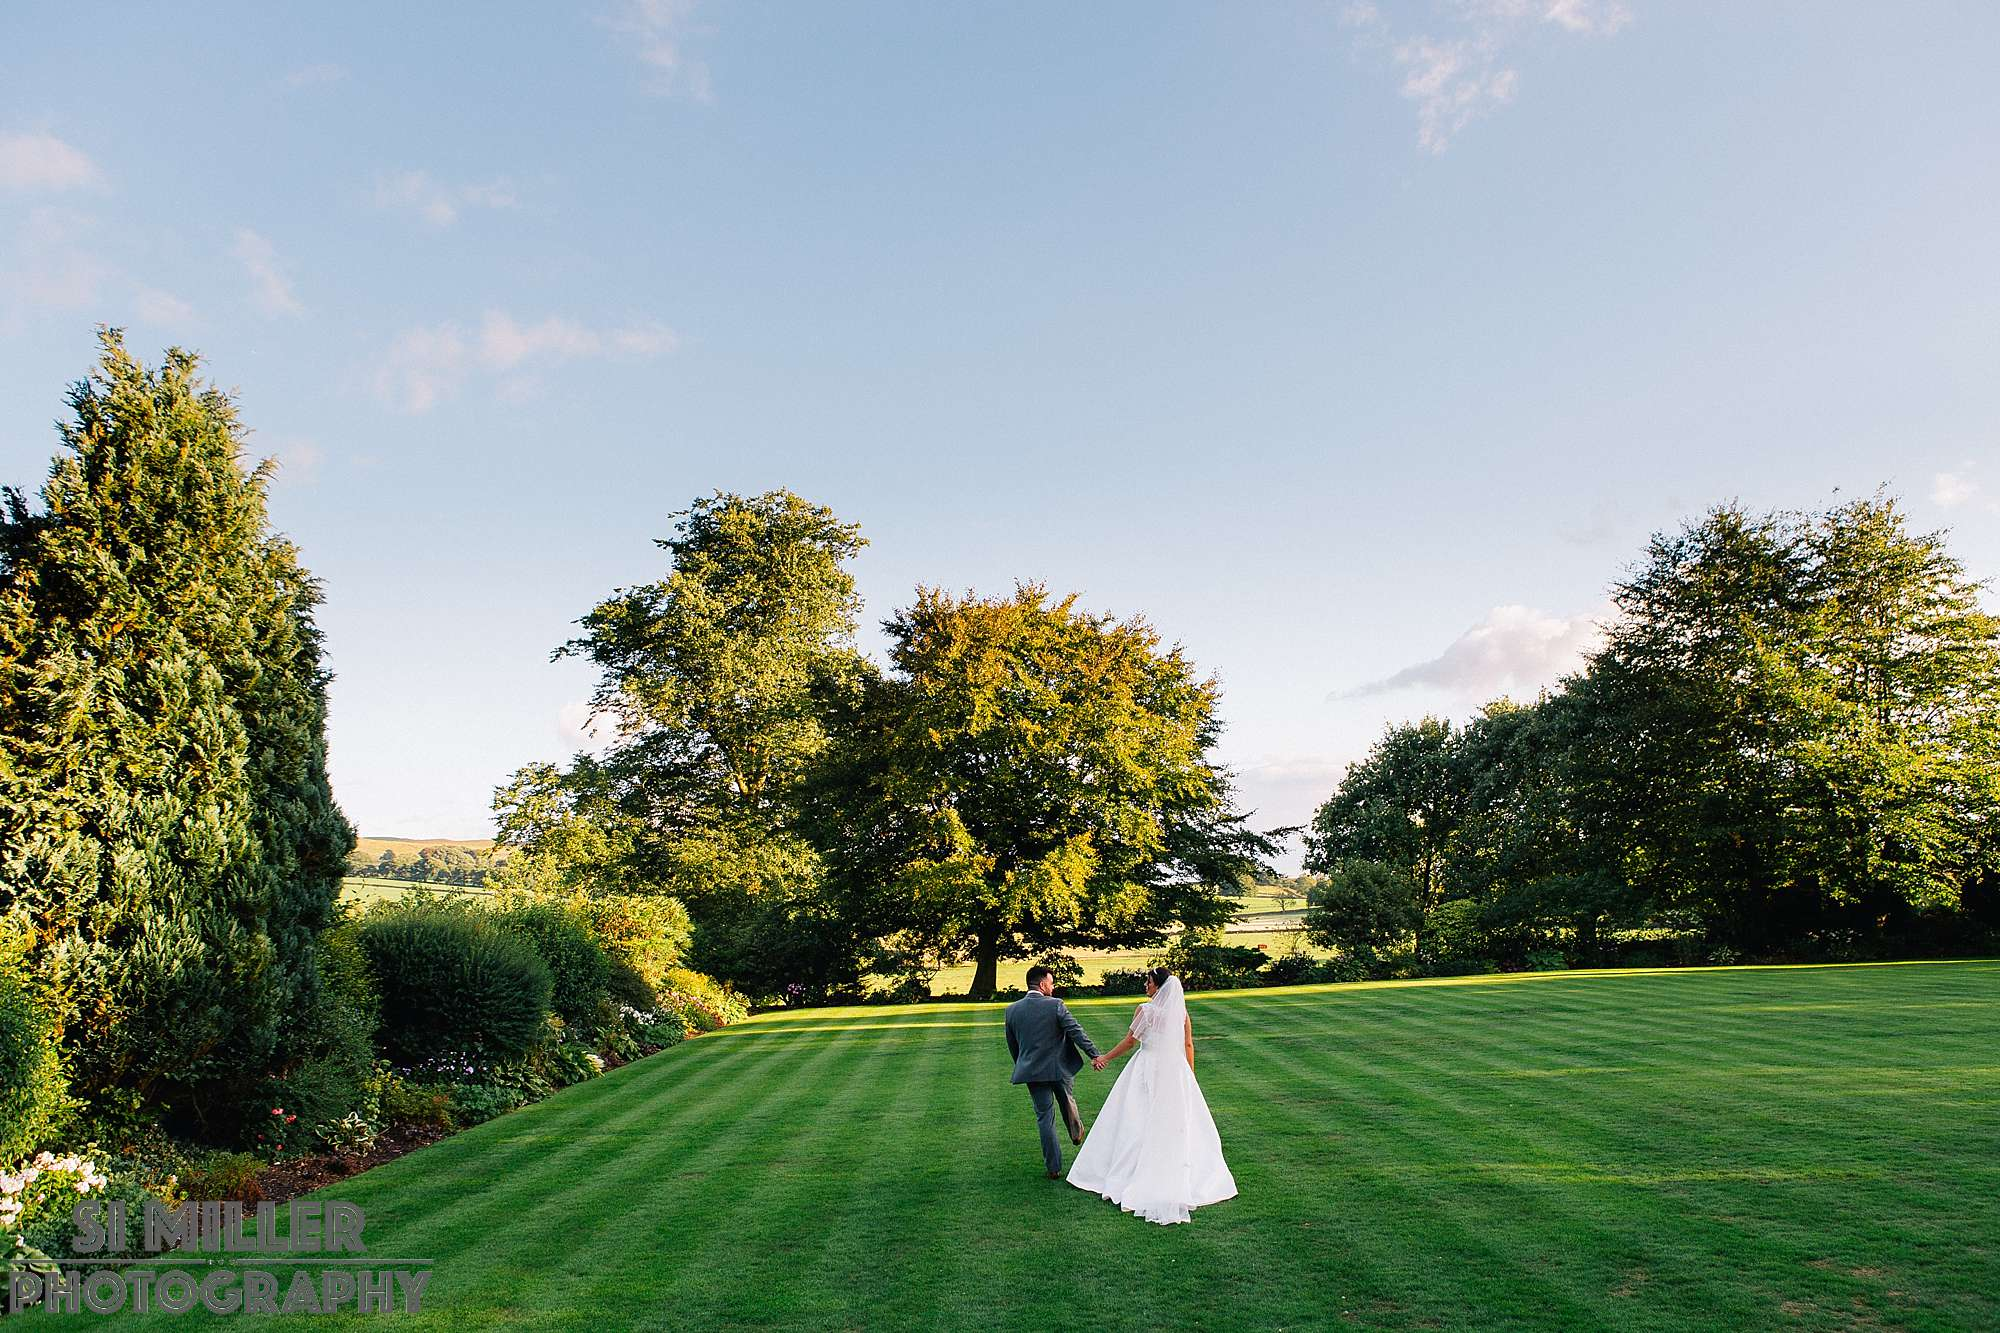 S+M Falcon Manor Wedding Photography